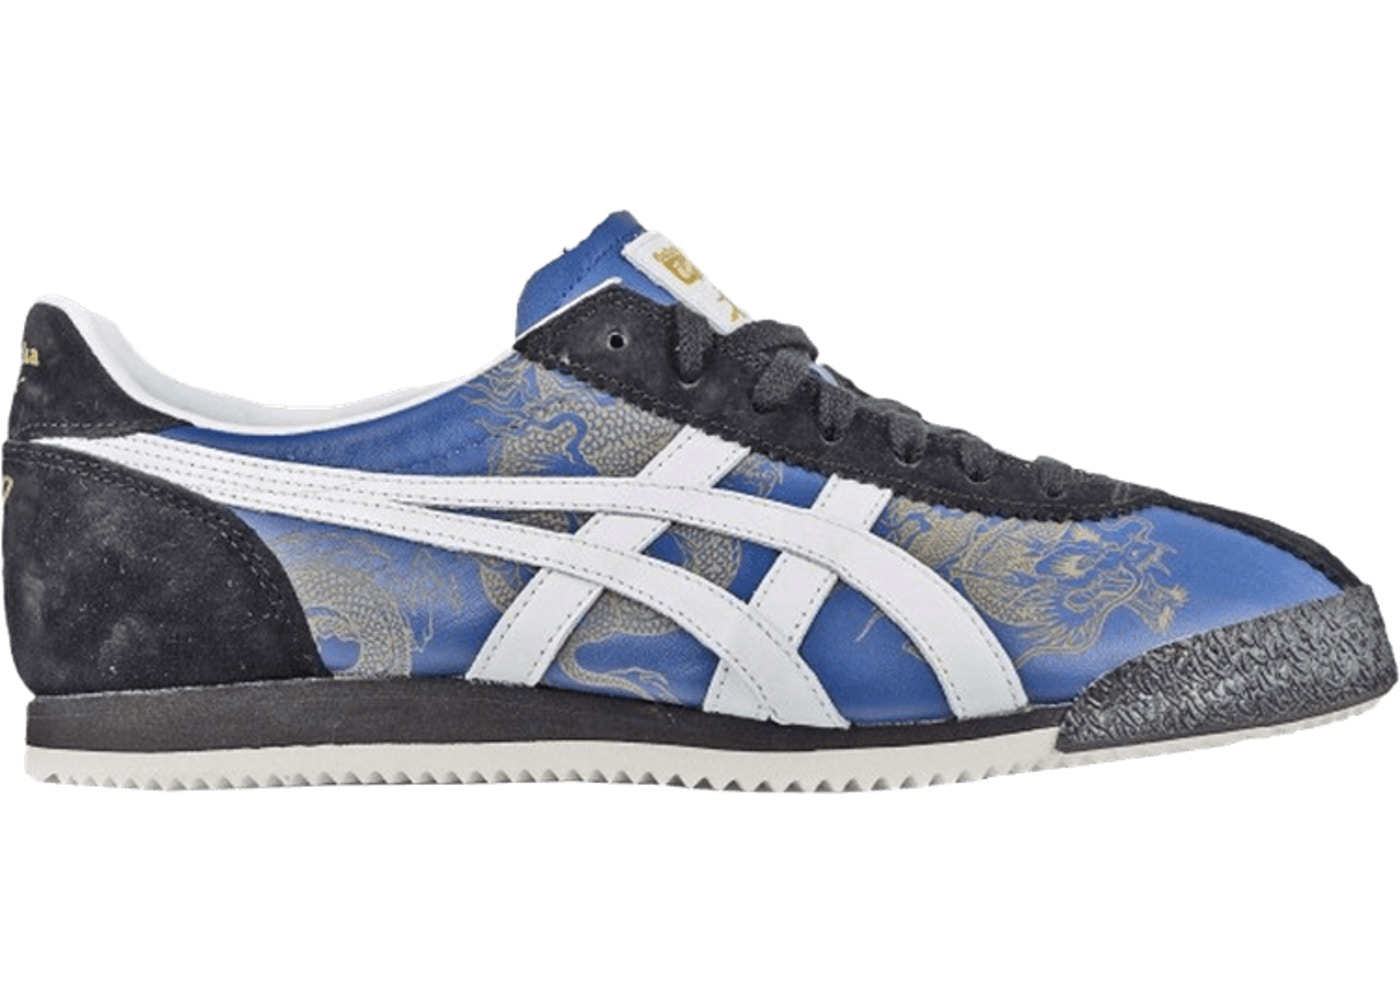 best sneakers 2b94a 4da78 Onitsuka Tiger Corsair Bait Bruce Lee